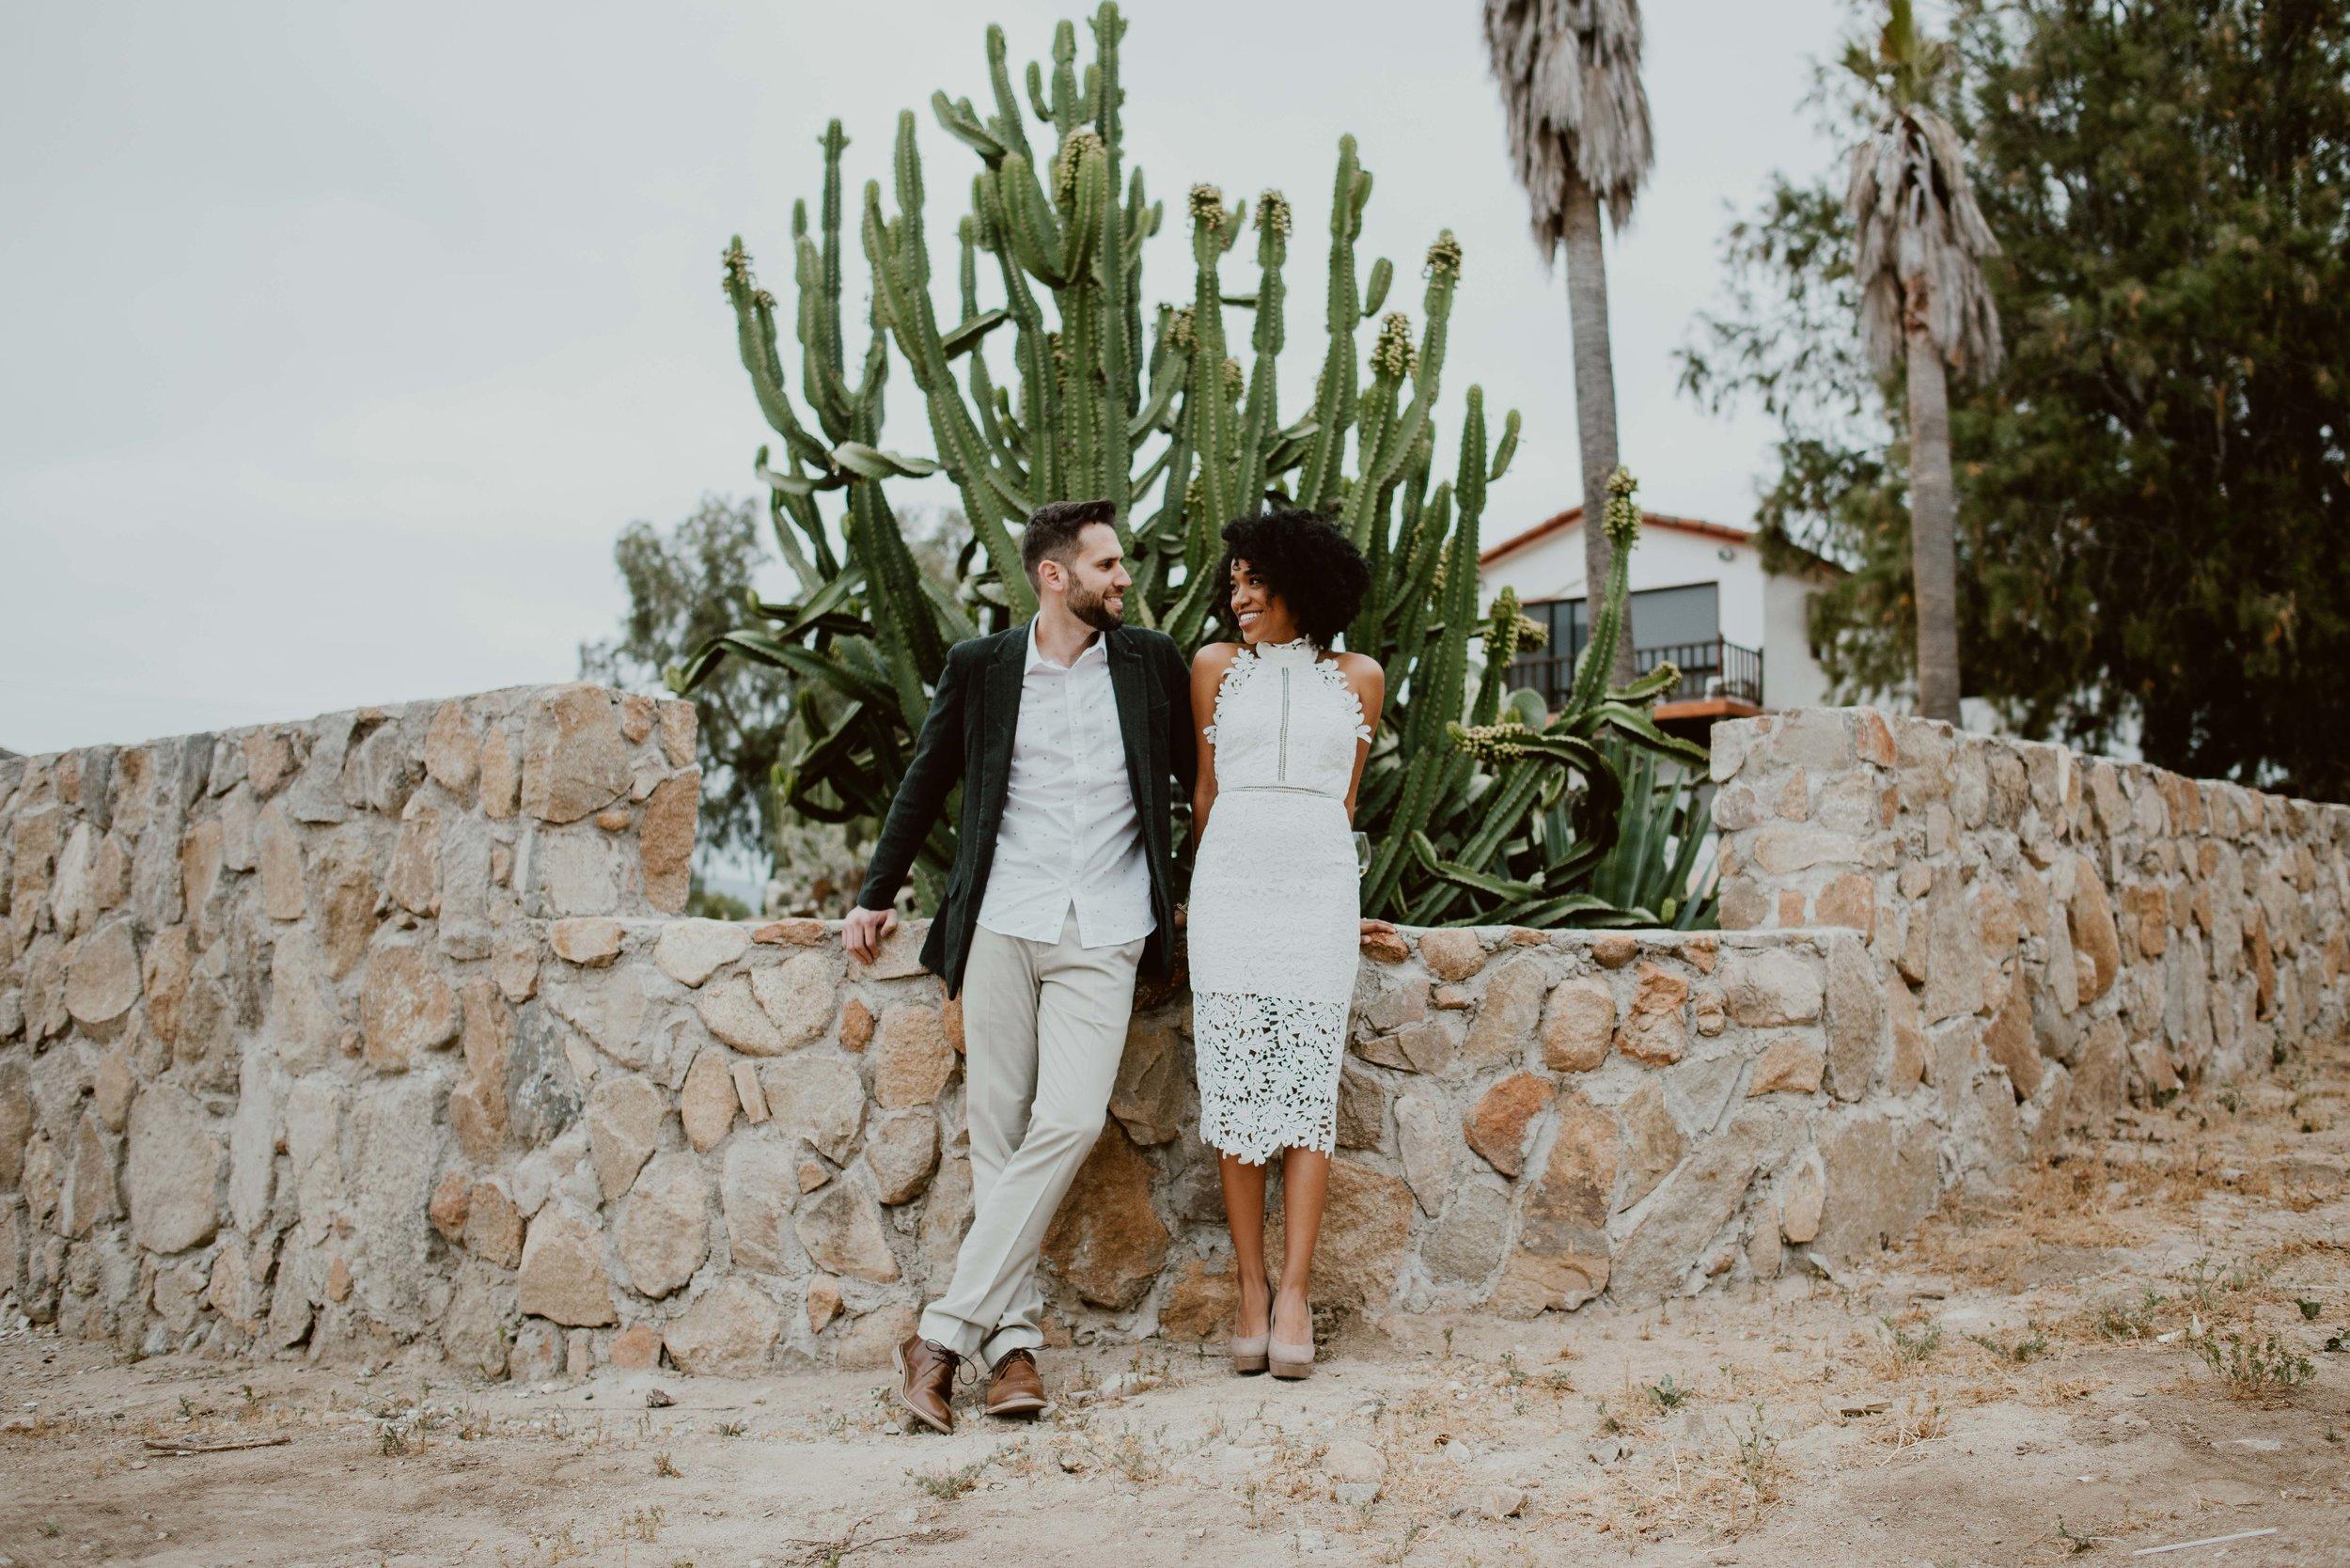 Nathalie+Carlin Engagement-2.jpg